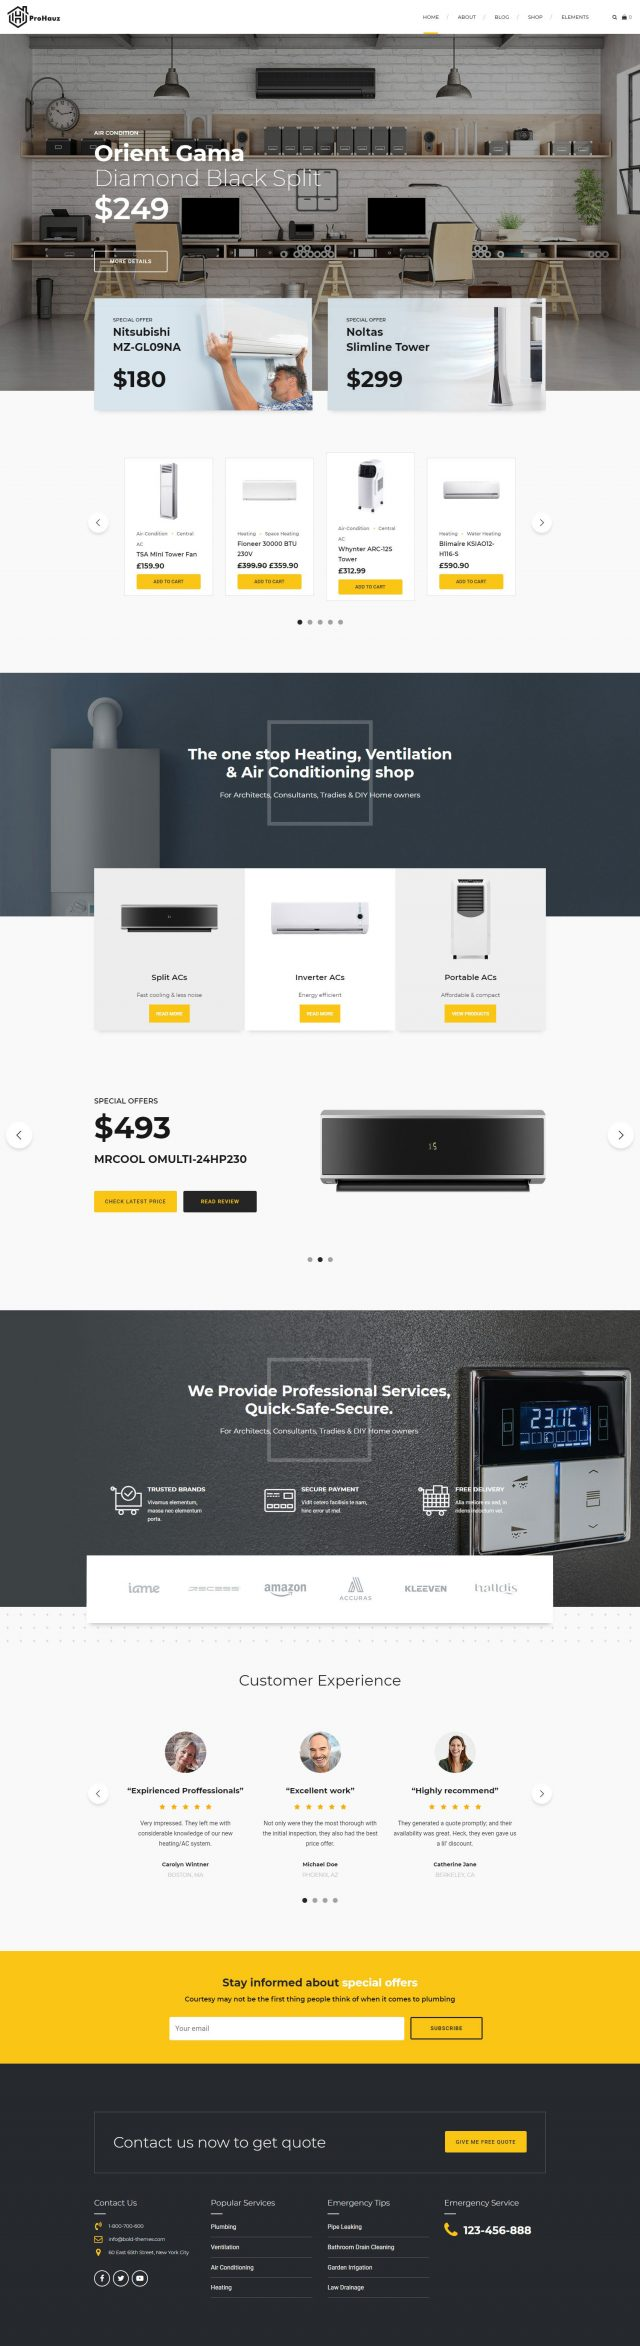 https://prohauz.bold-themes.com/wp-content/uploads/2018/11/AC-Shop-640x2346.jpg